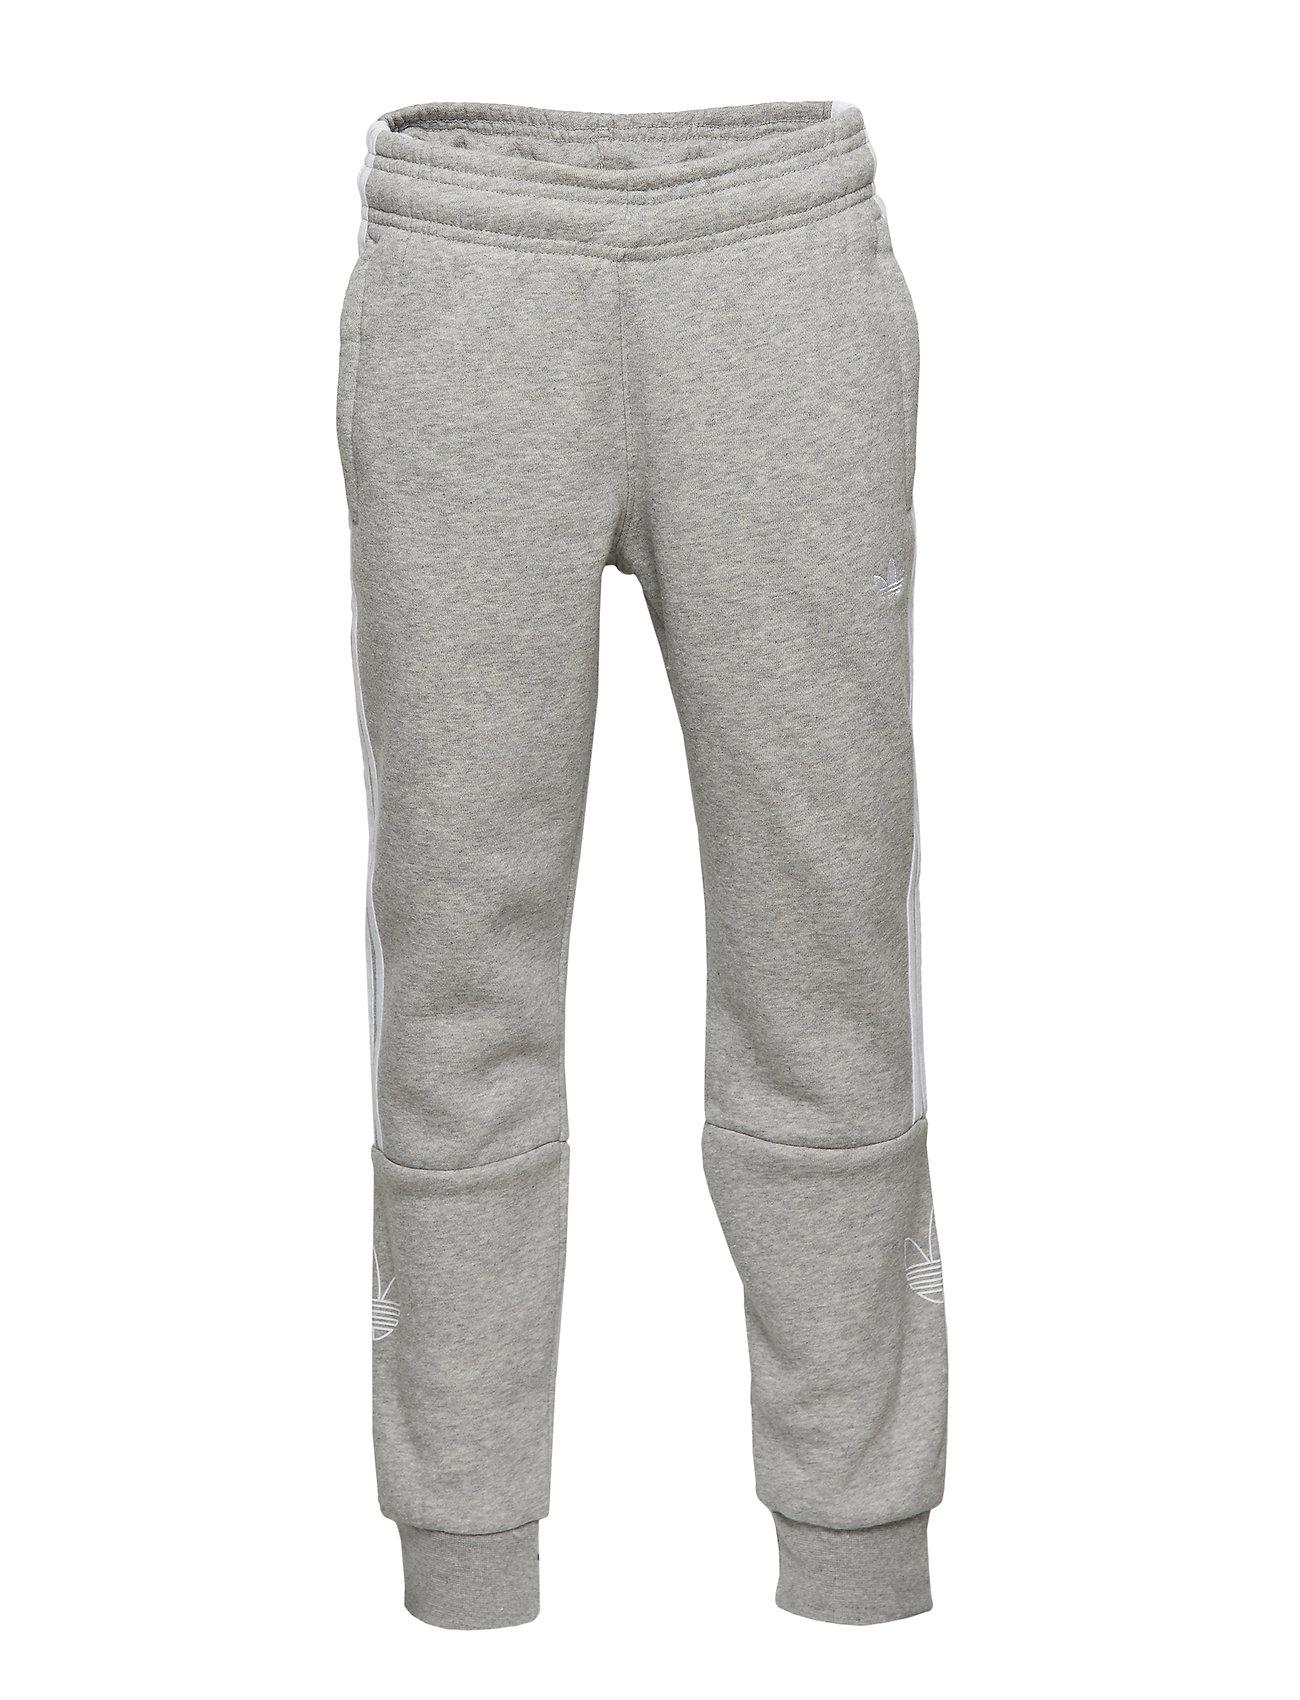 adidas Originals OUTLINE PANTS - MGREYH/WHITE